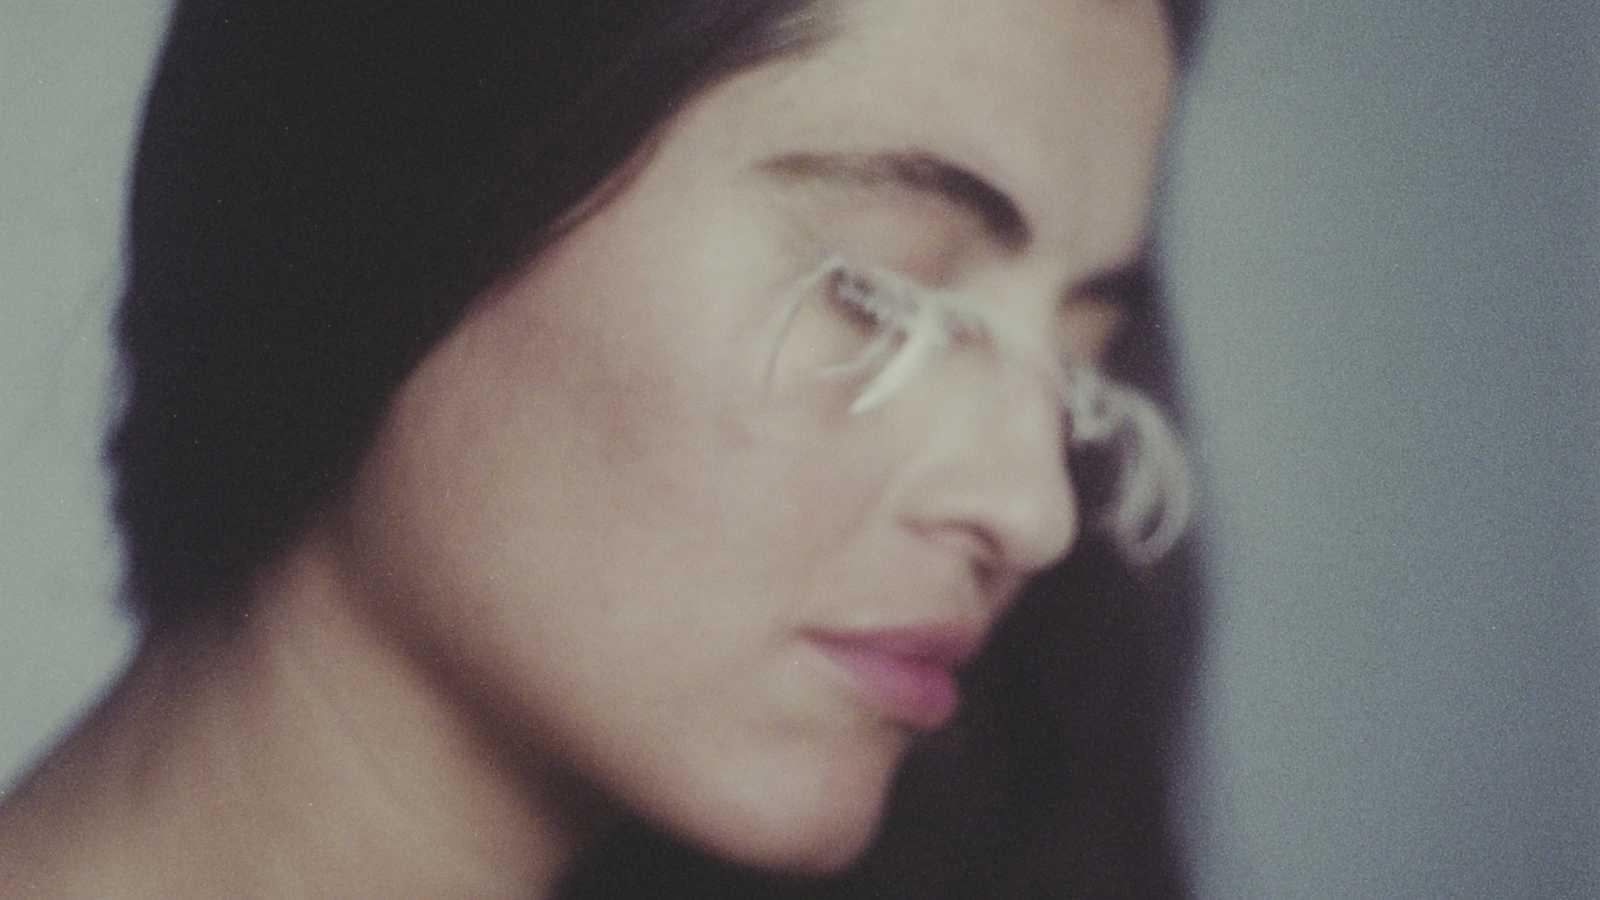 Siglo 21 - Silvia Pérez Cruz - 28/08/20 - escuchar  ahora